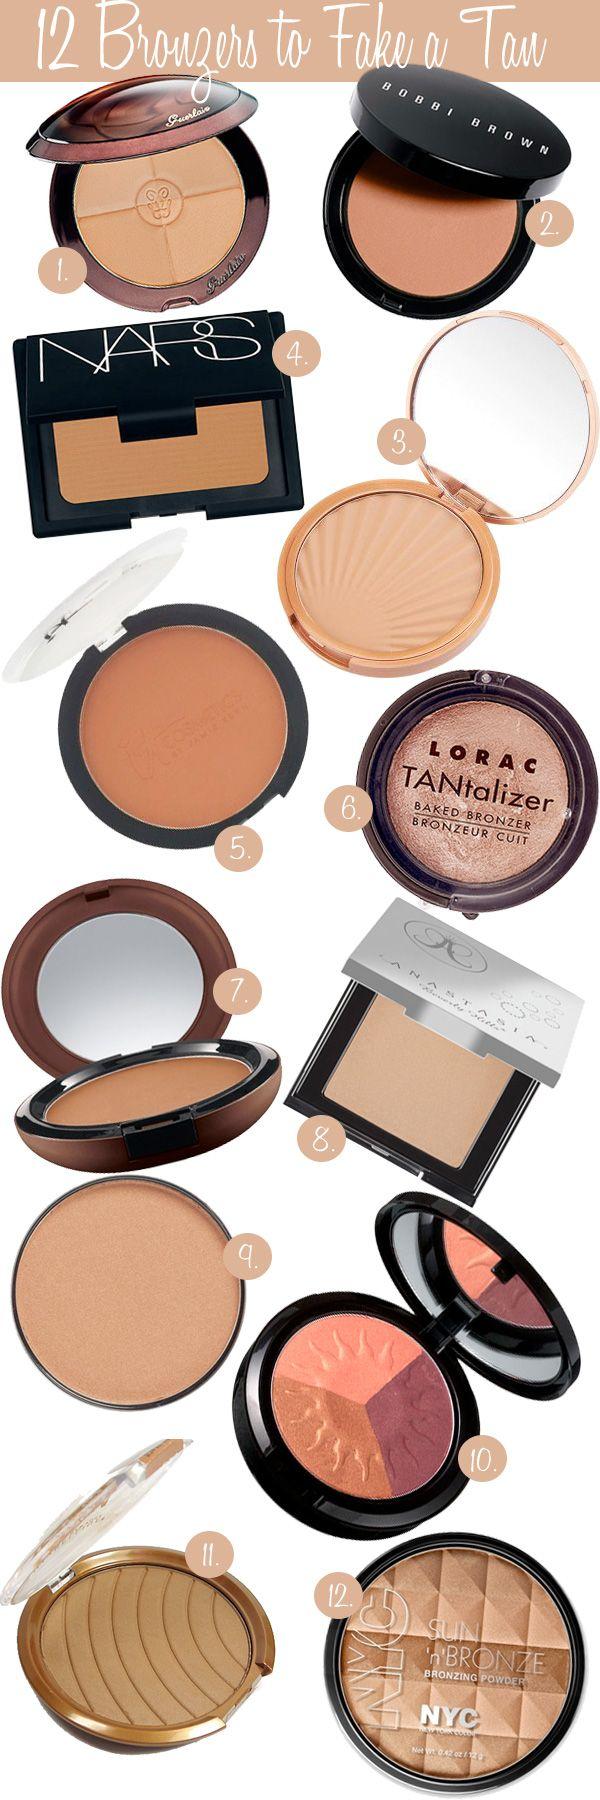 Best Bronzers to Fake a Tan #bronzer